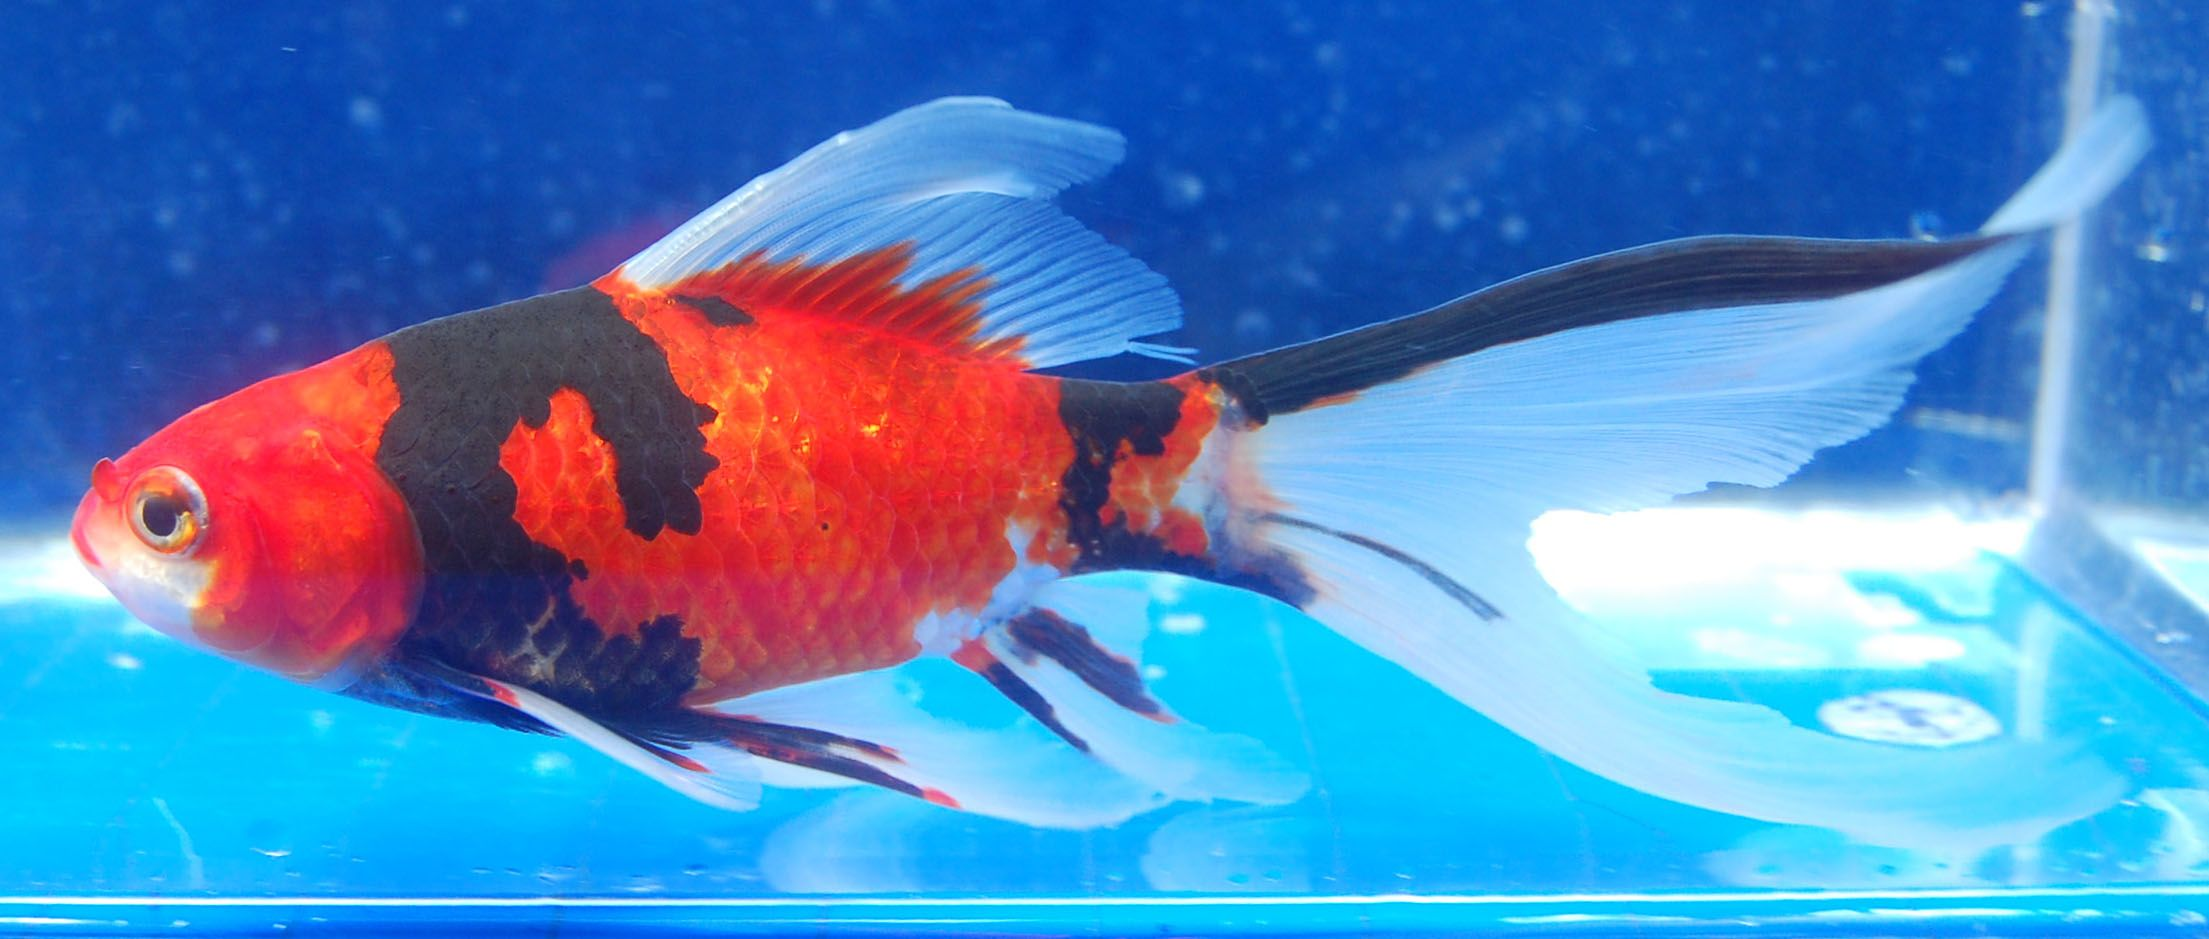 Goldfish - Sanke like Shubunkin | The loveable Goldfish